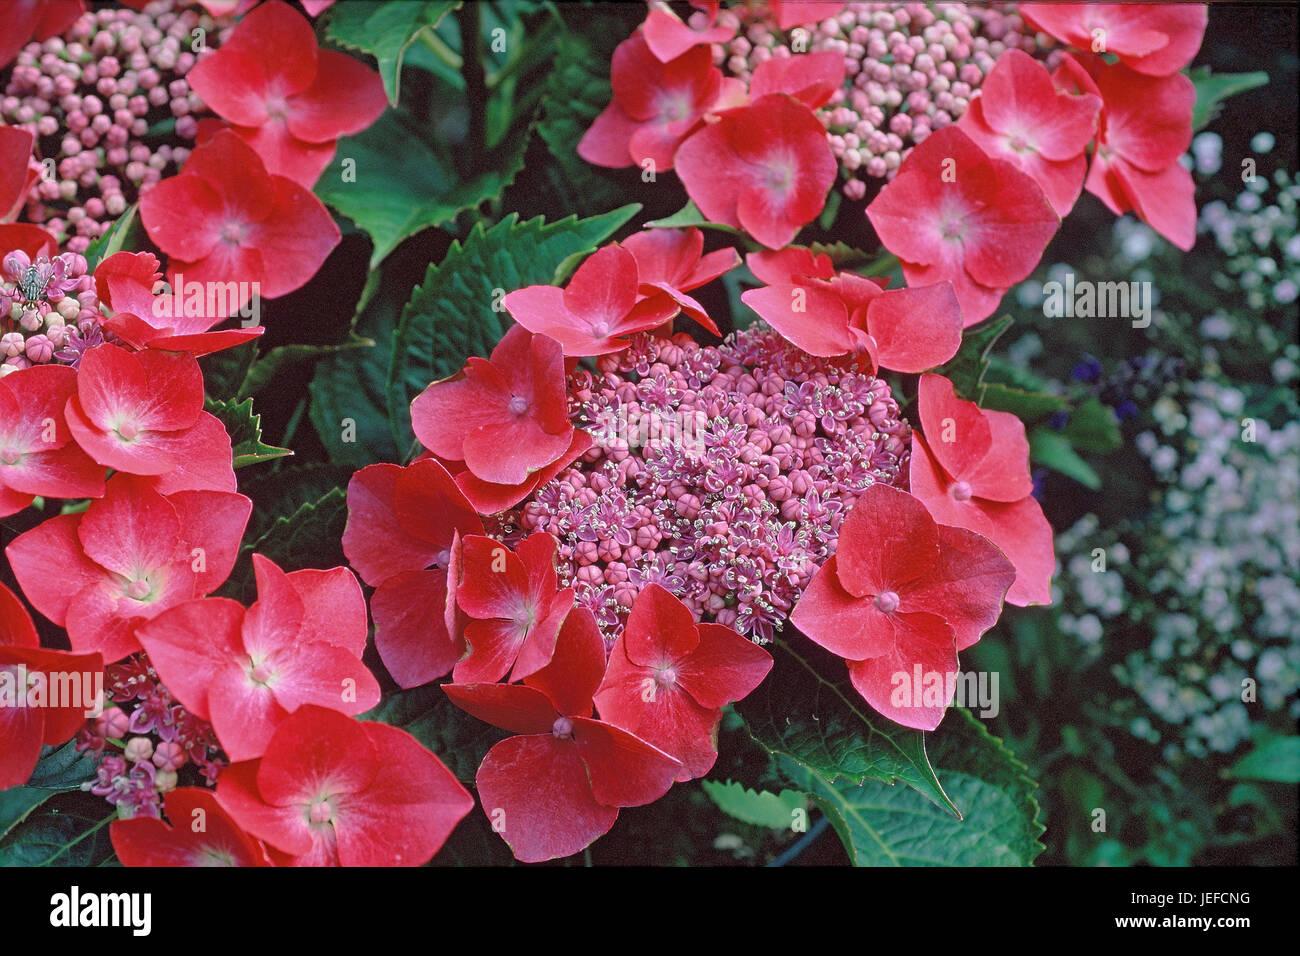 Garden hydrangea, Hydrangea macrophylla cardinal, Gartenhortensie, Hydrangea macrophylla Kardinal Stock Photo